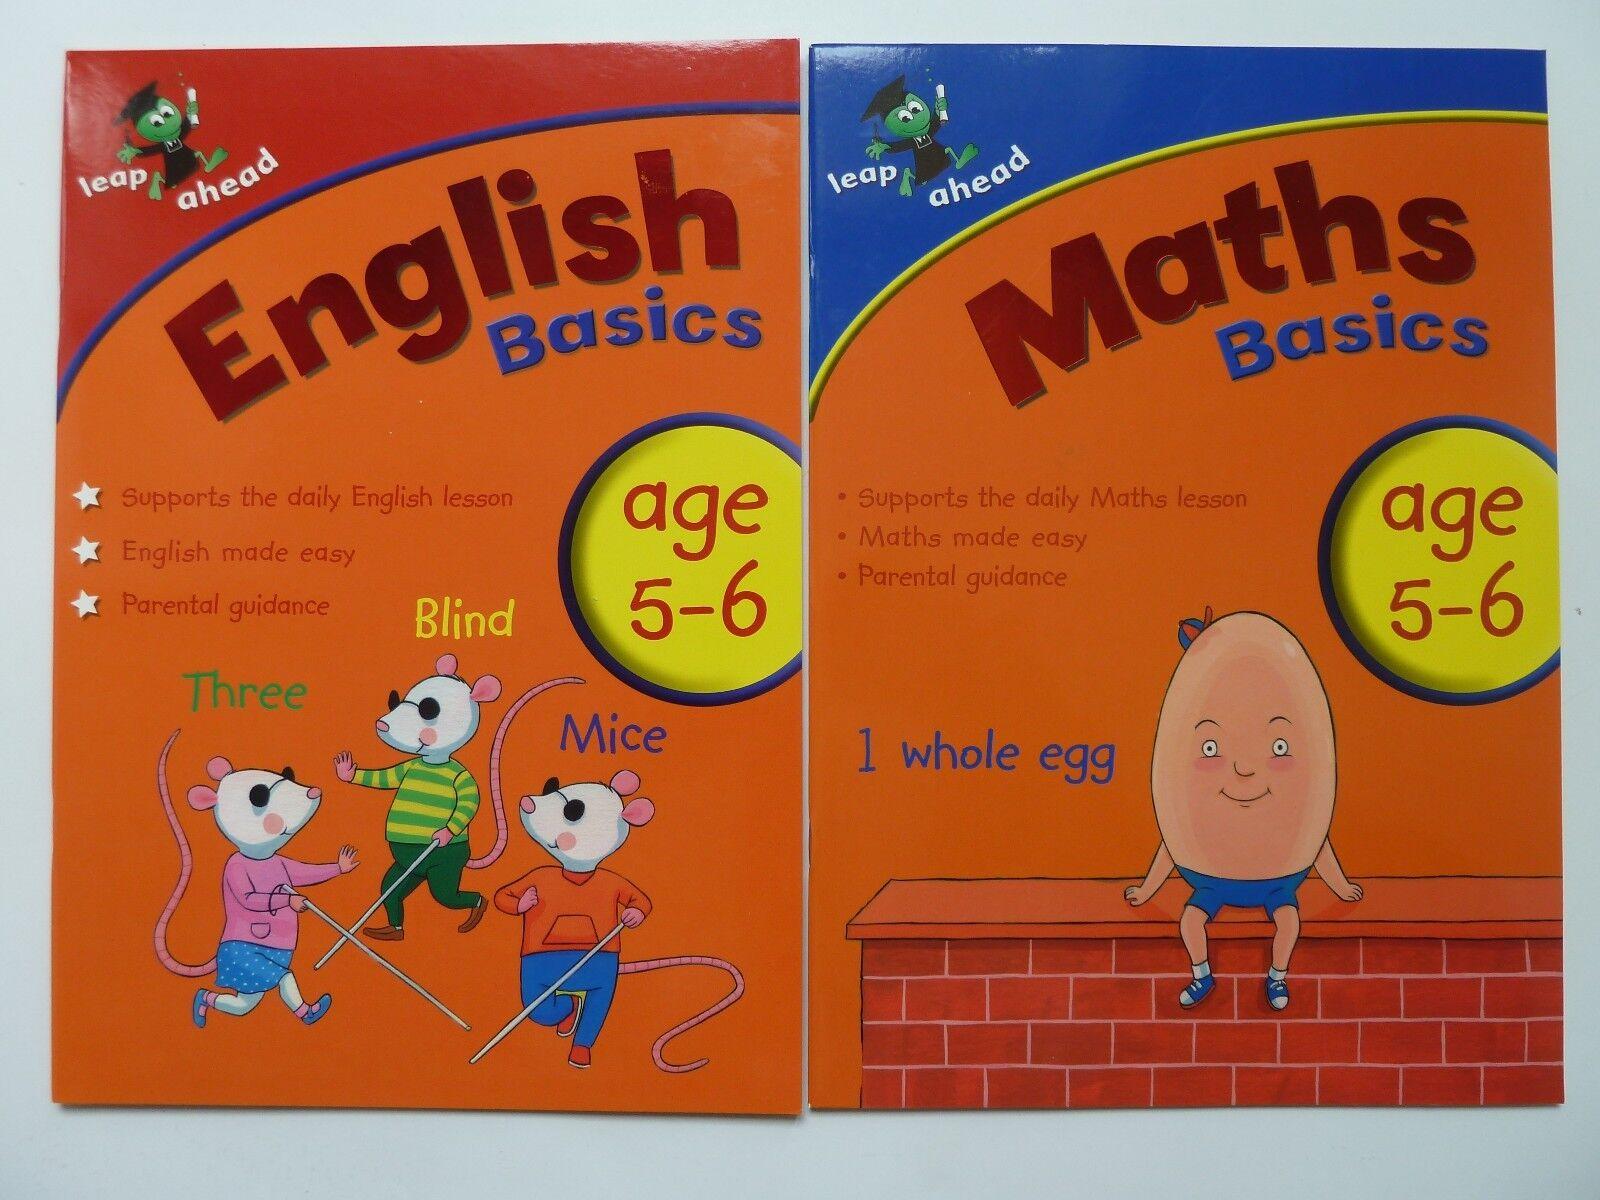 0616849f2 LeapAhead Learning English Maths Educational Workbooks Kids Ages 5-6 ...